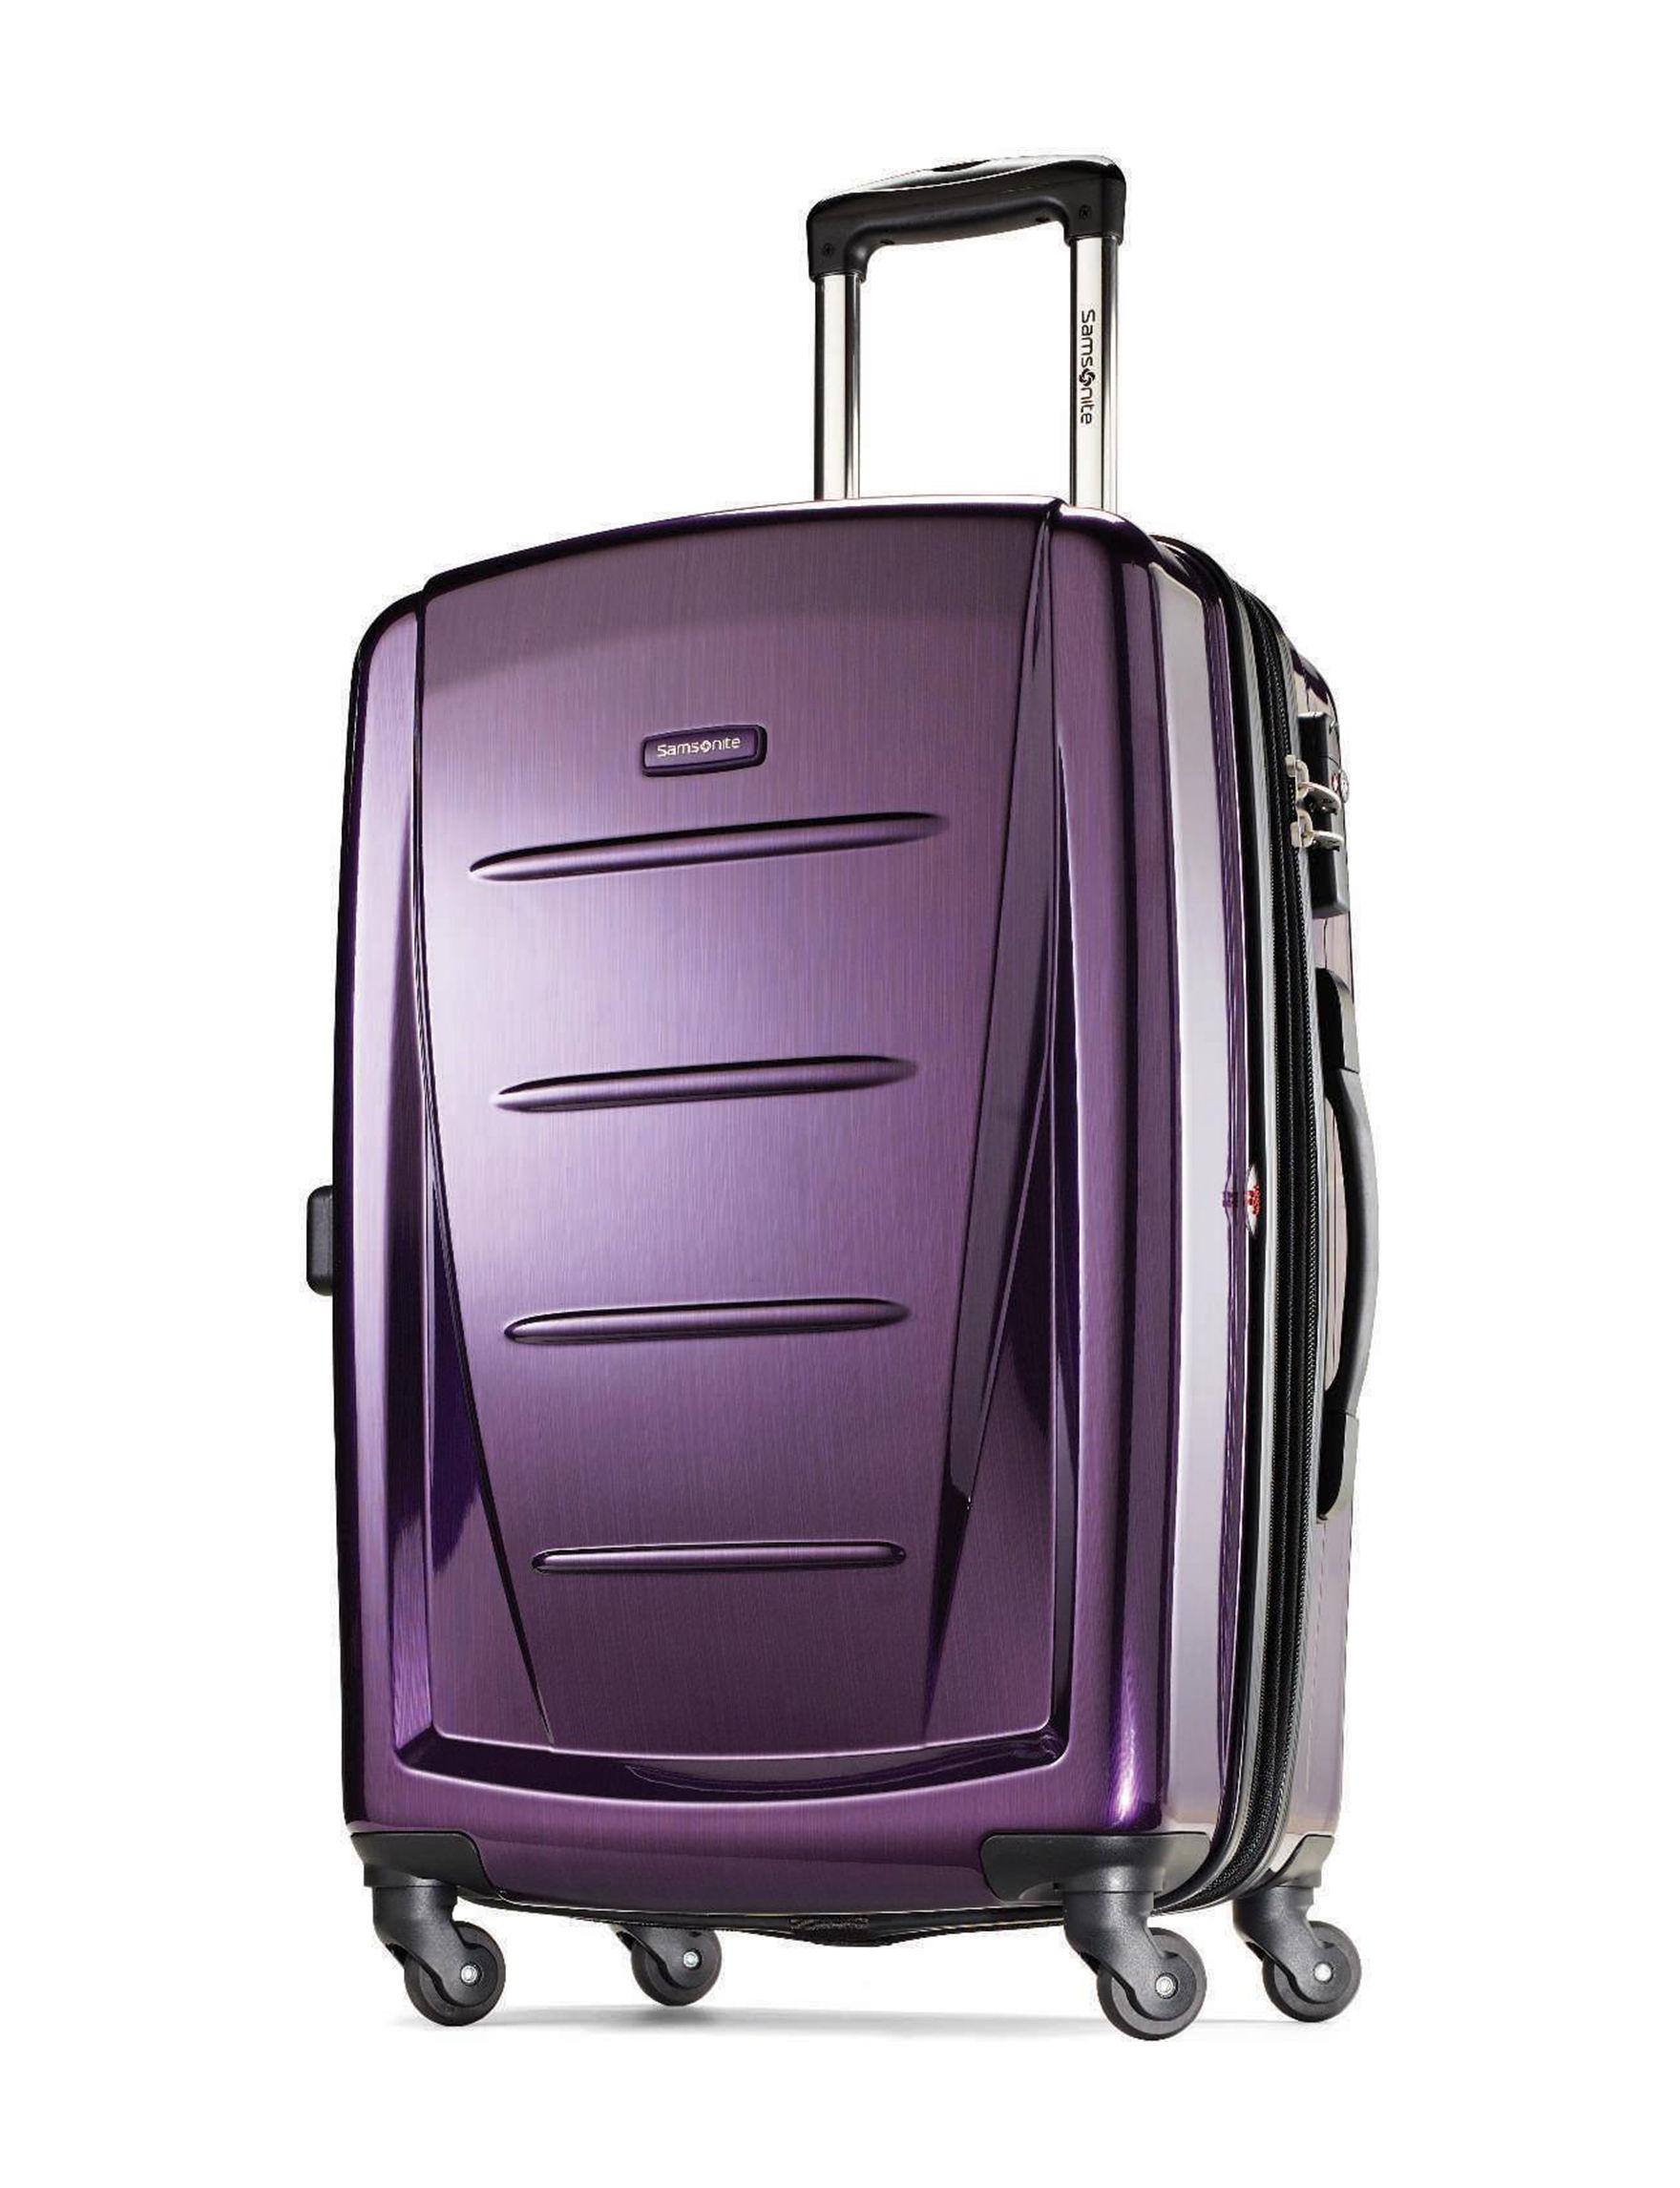 Samsonite Purple Upright Spinners